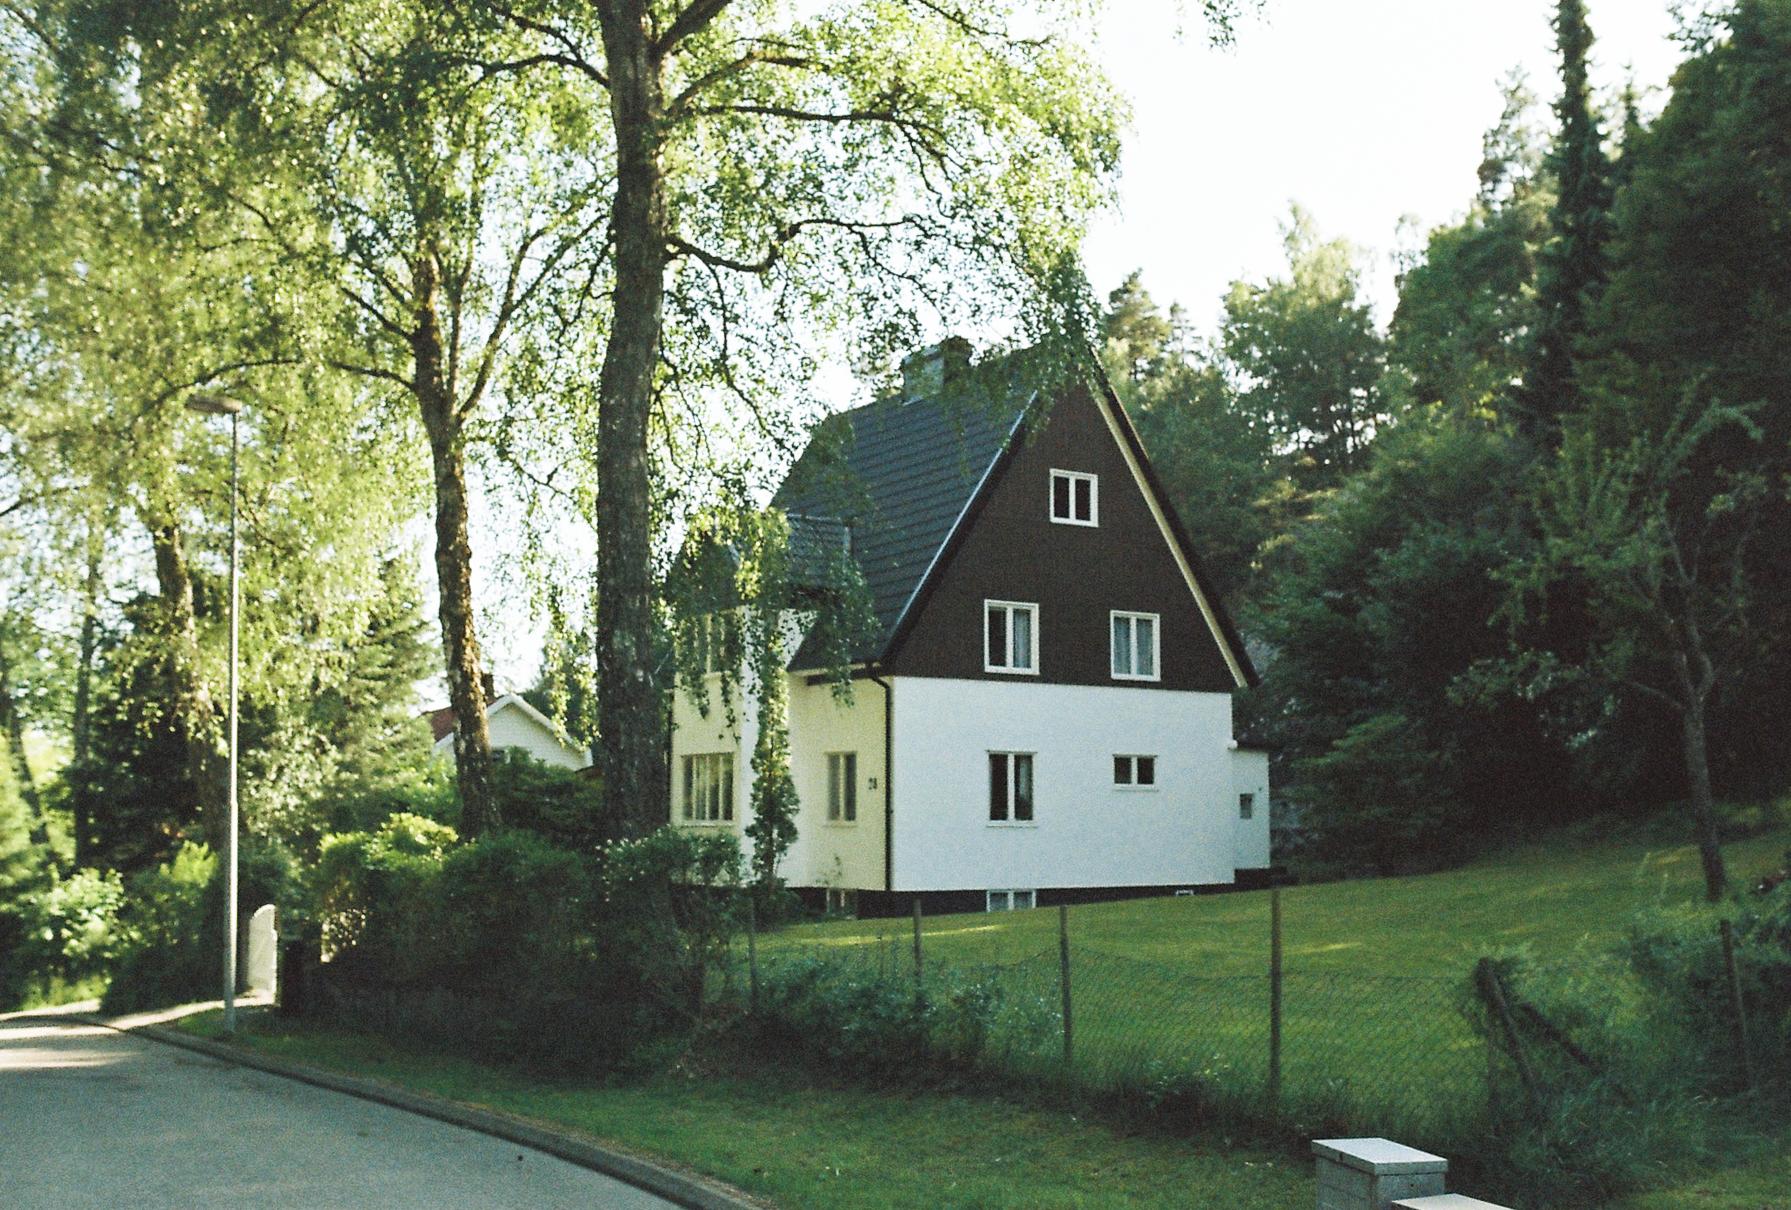 swedish-midsommar-2018-35mm-90.jpg